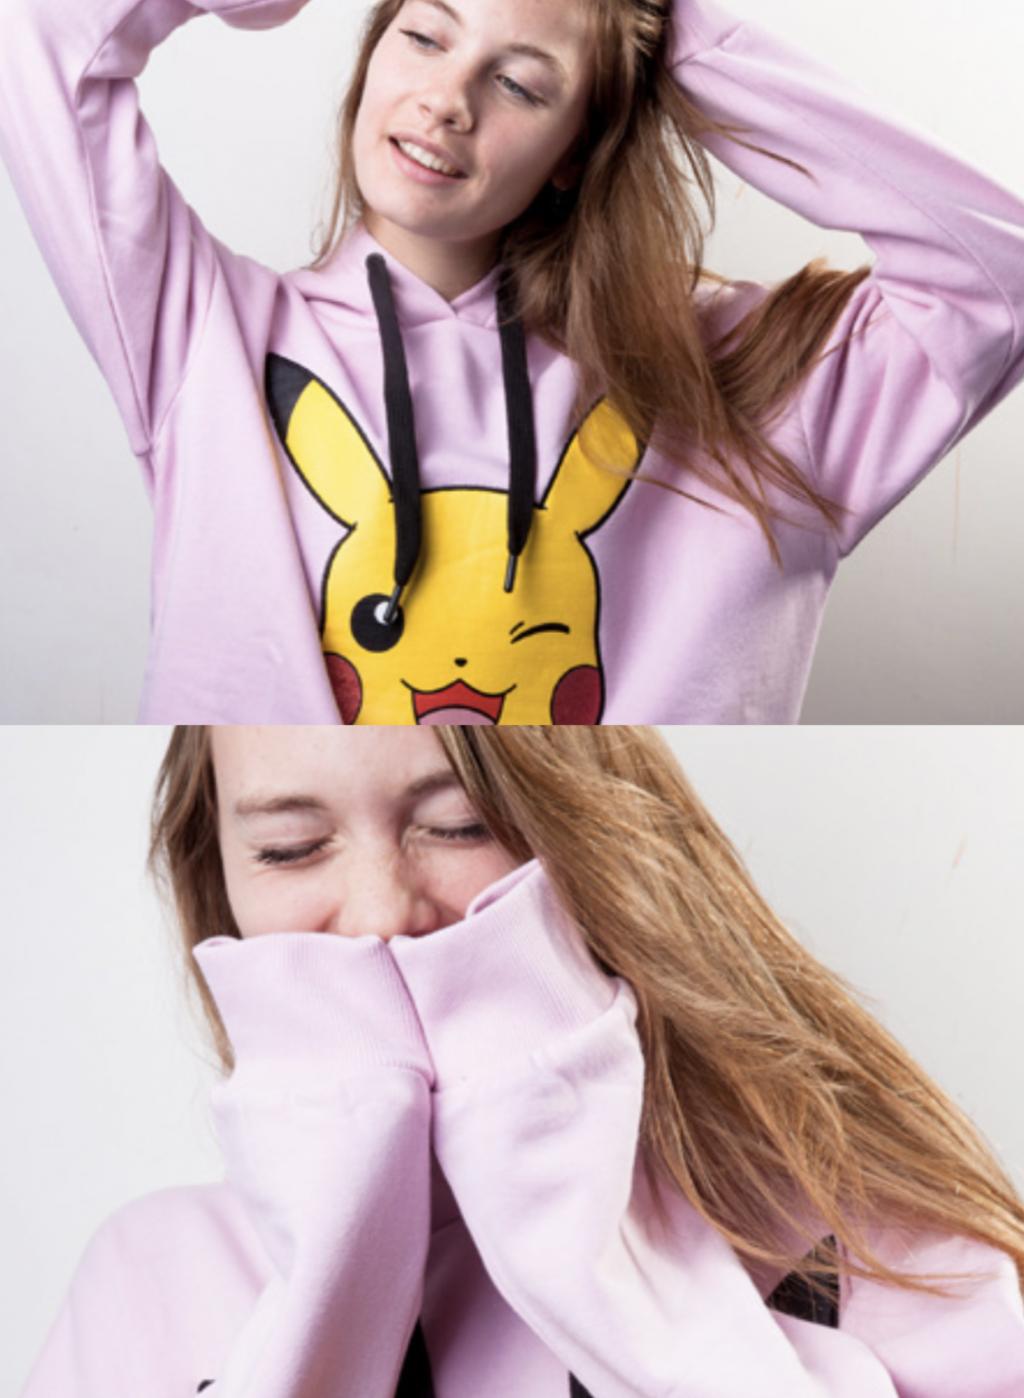 POKEMON - Women's Sweatshirt - Pikachu (M)_4